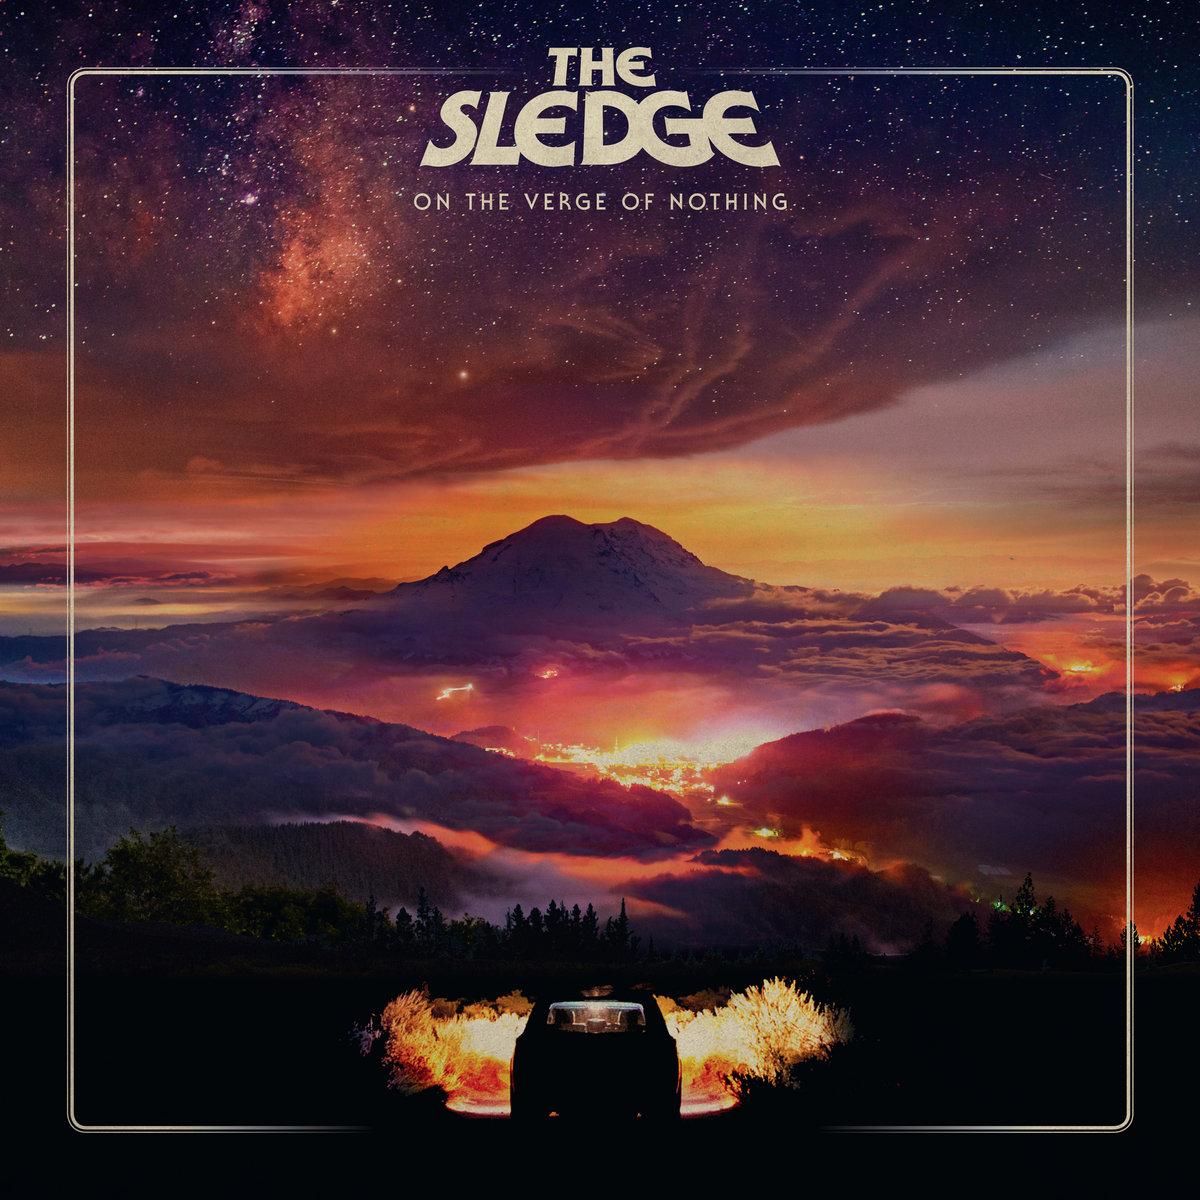 The Sledge - On The Verge Of Nothing [LP] (Orange vinyl)